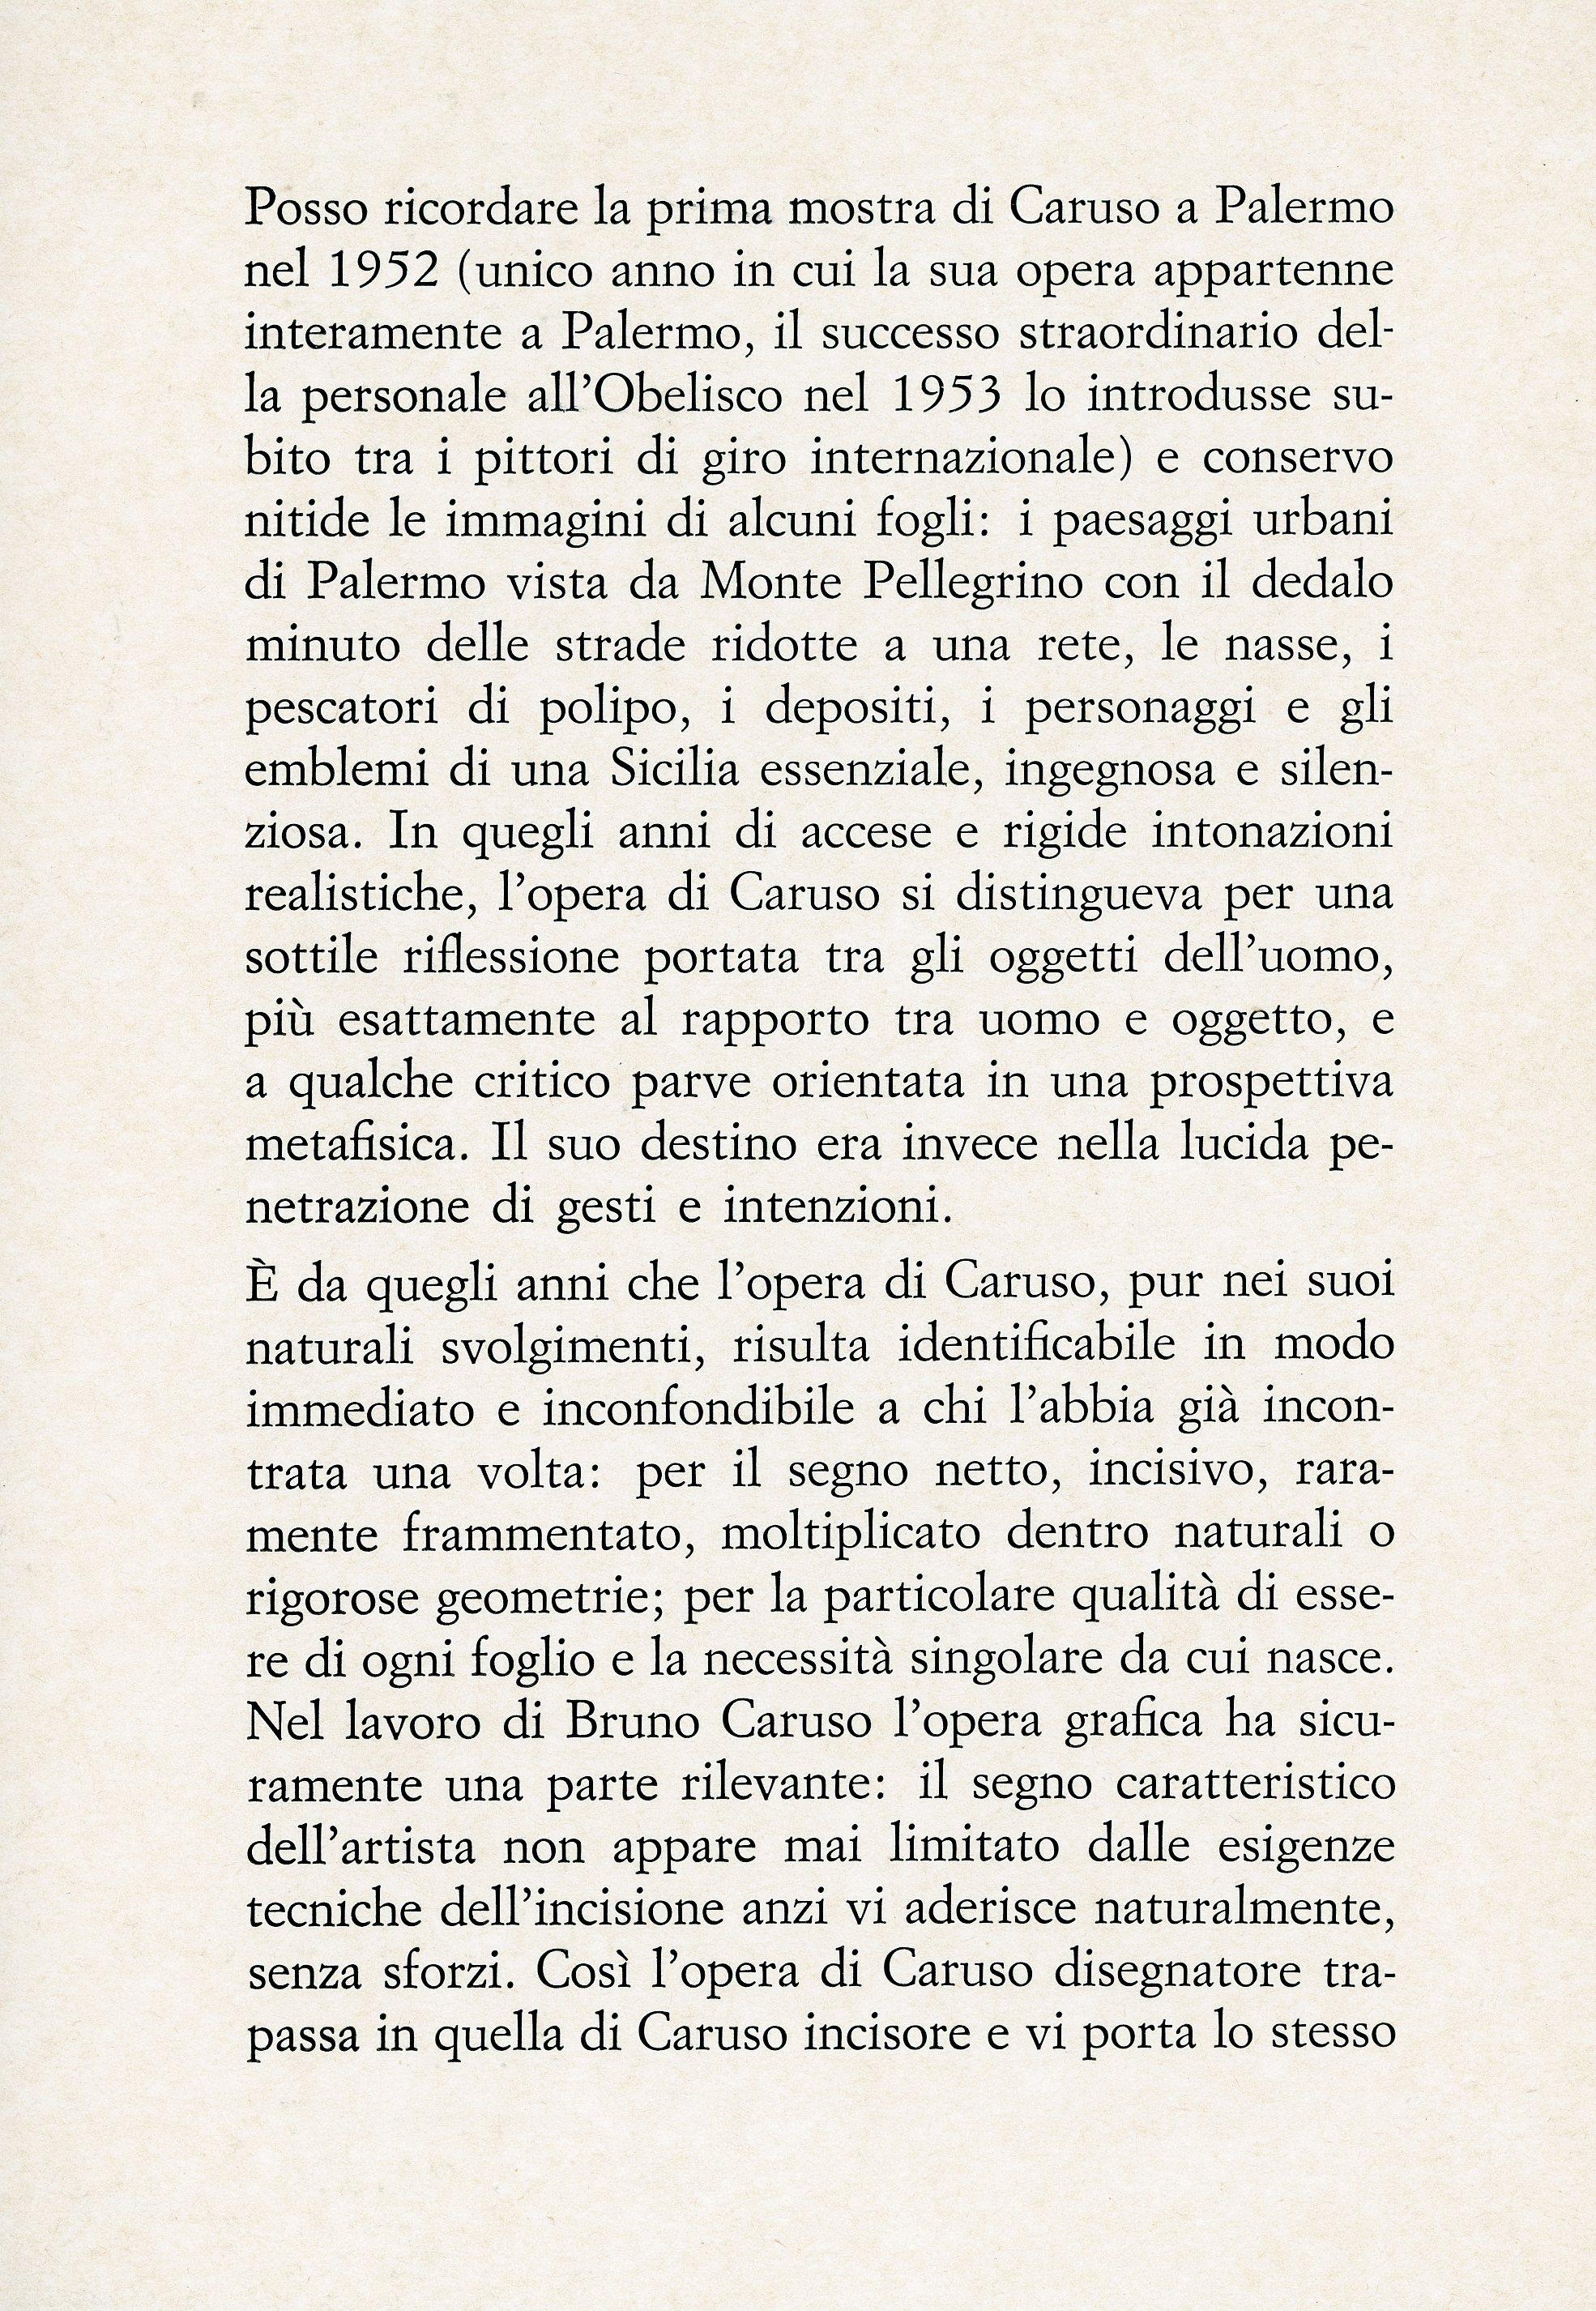 1967-02 Libreria Ghelfi - Bruno Caruso_03.jpg